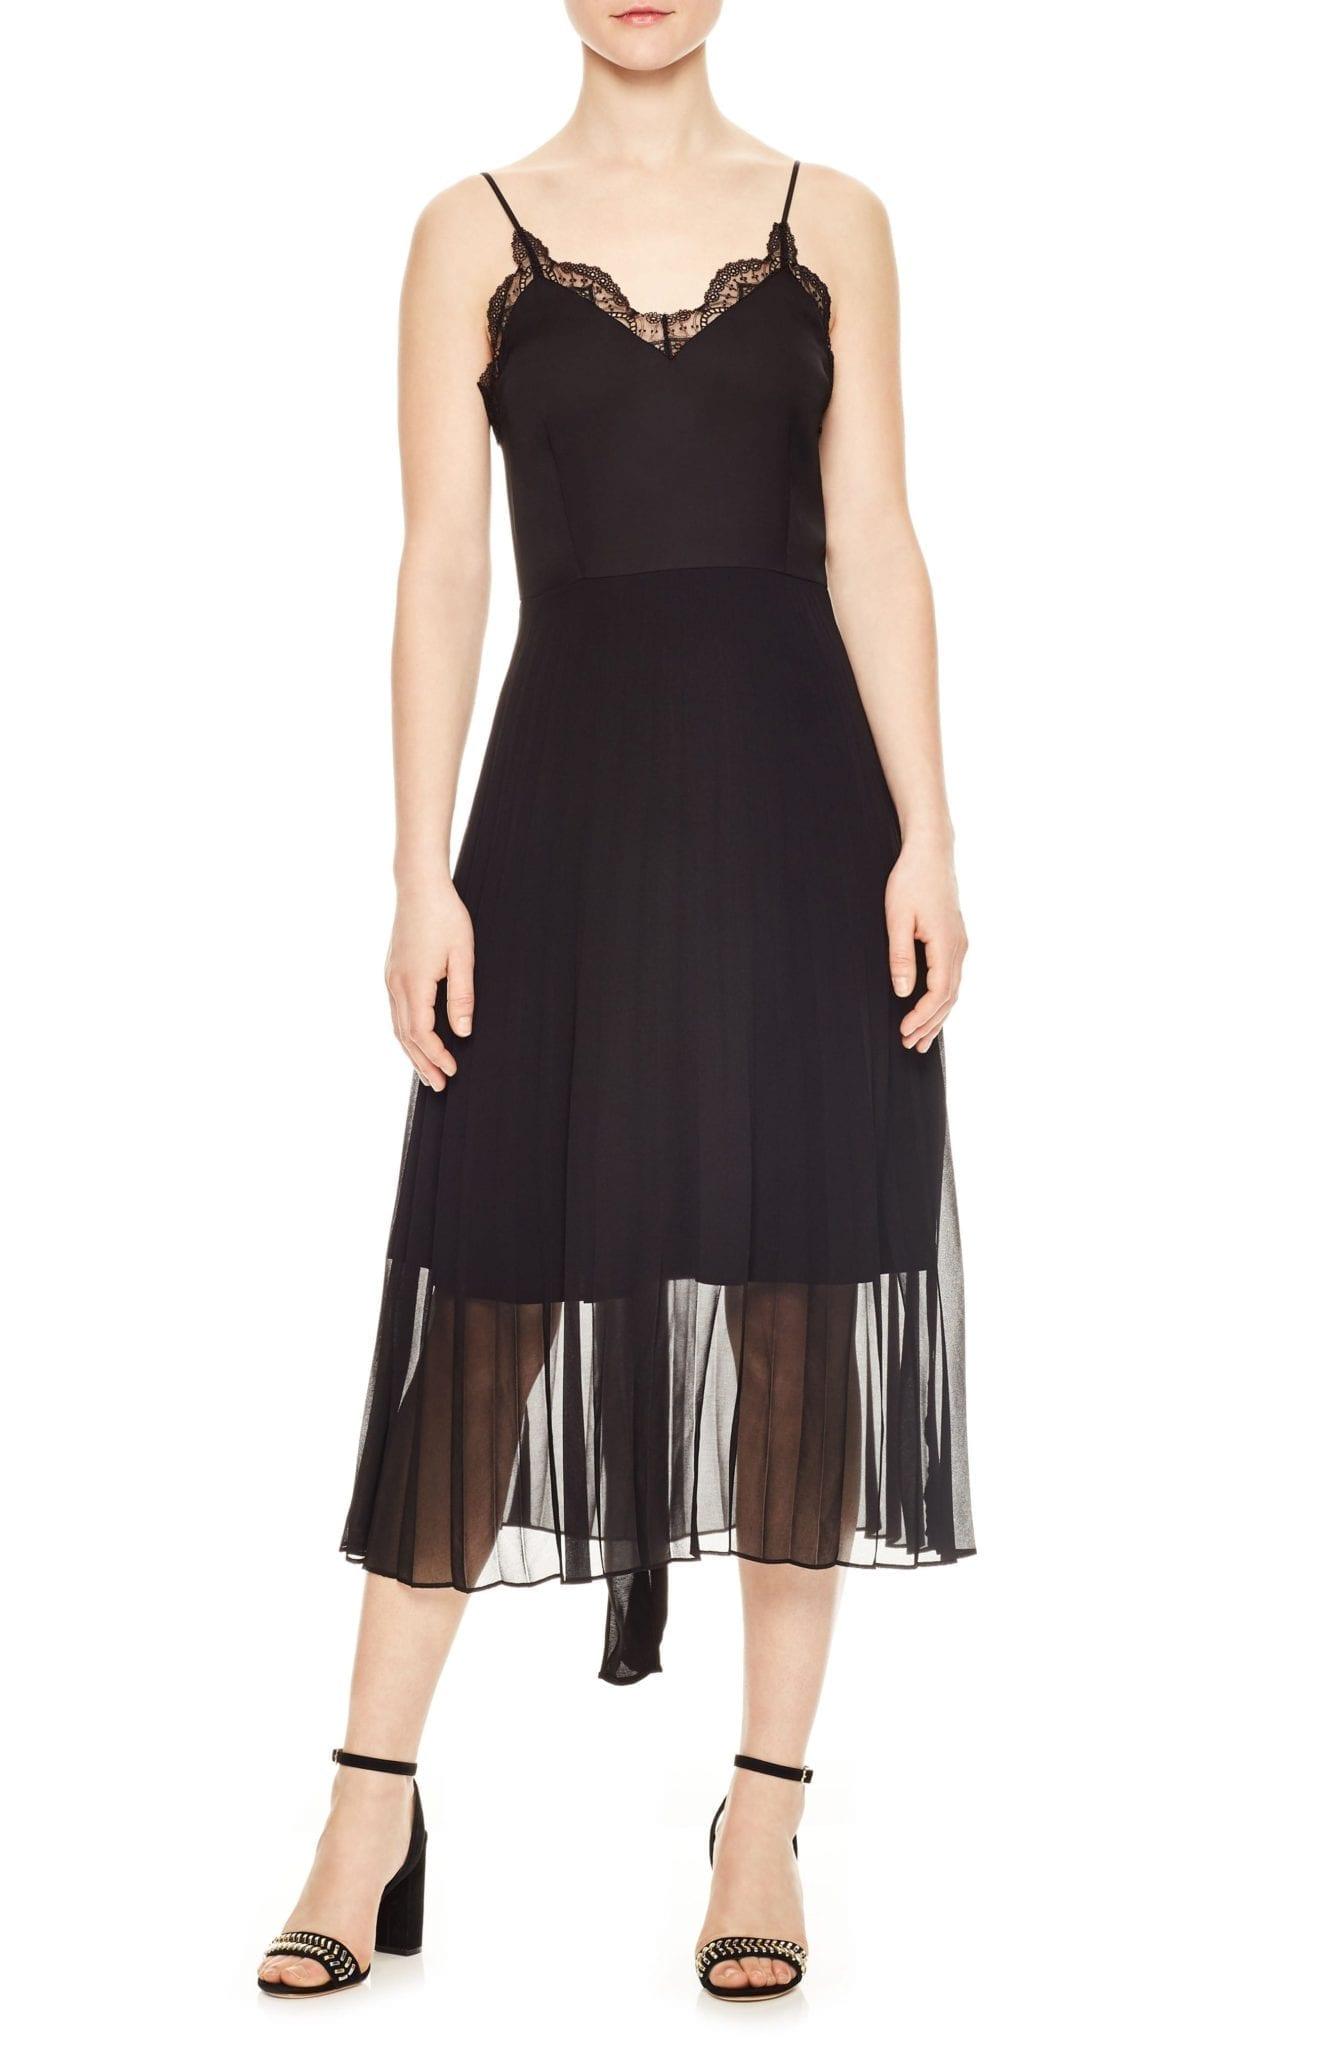 SANDRO Pleated Chiffon Overlay Noir Dress